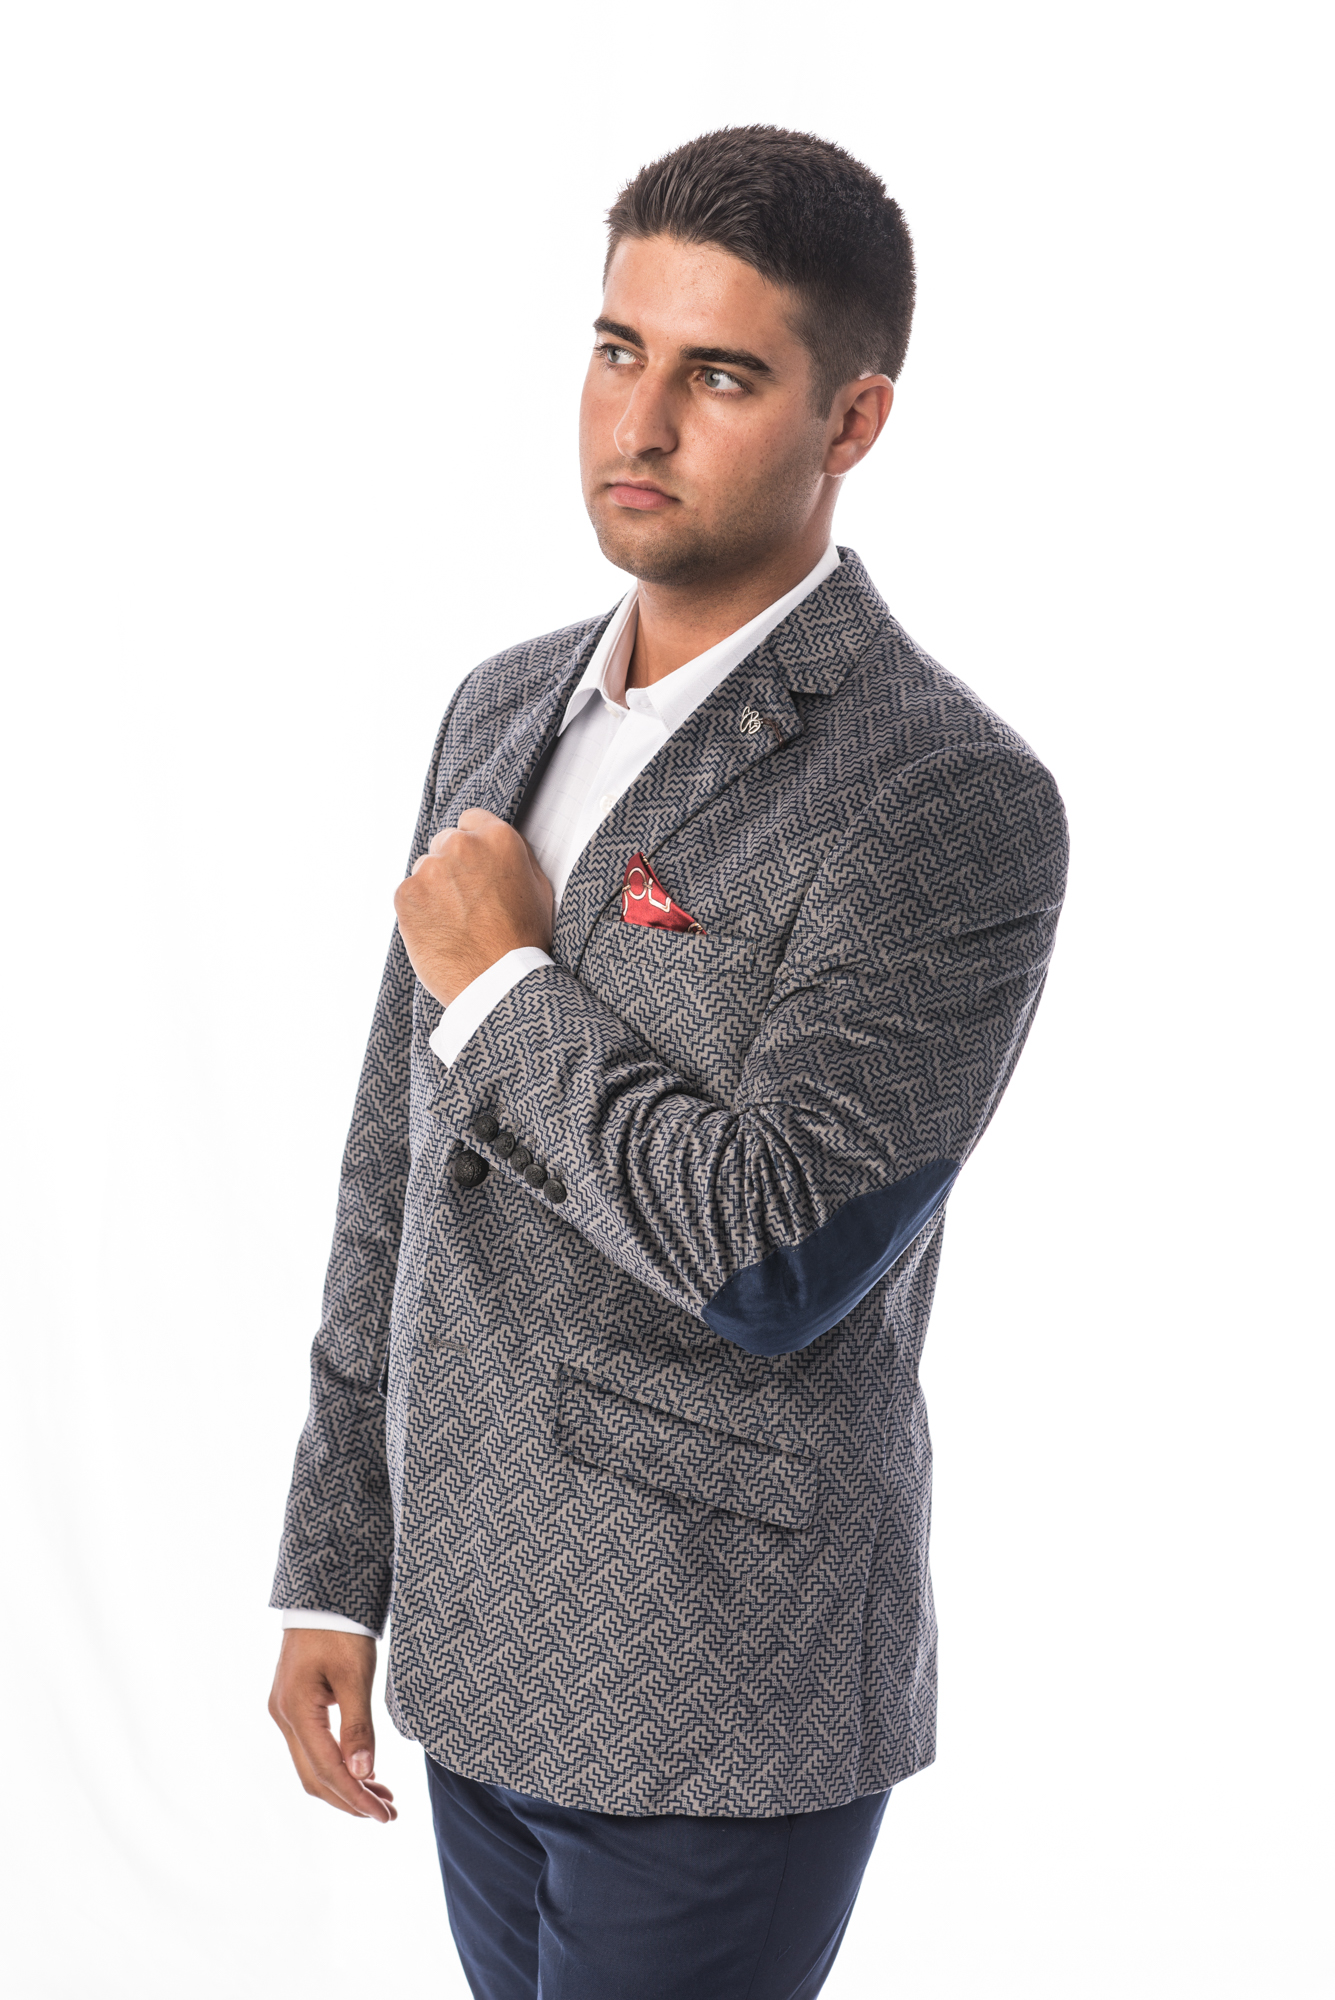 Geometric Velvet Men Blazers / Sports Coat Jacket EBBS1680M